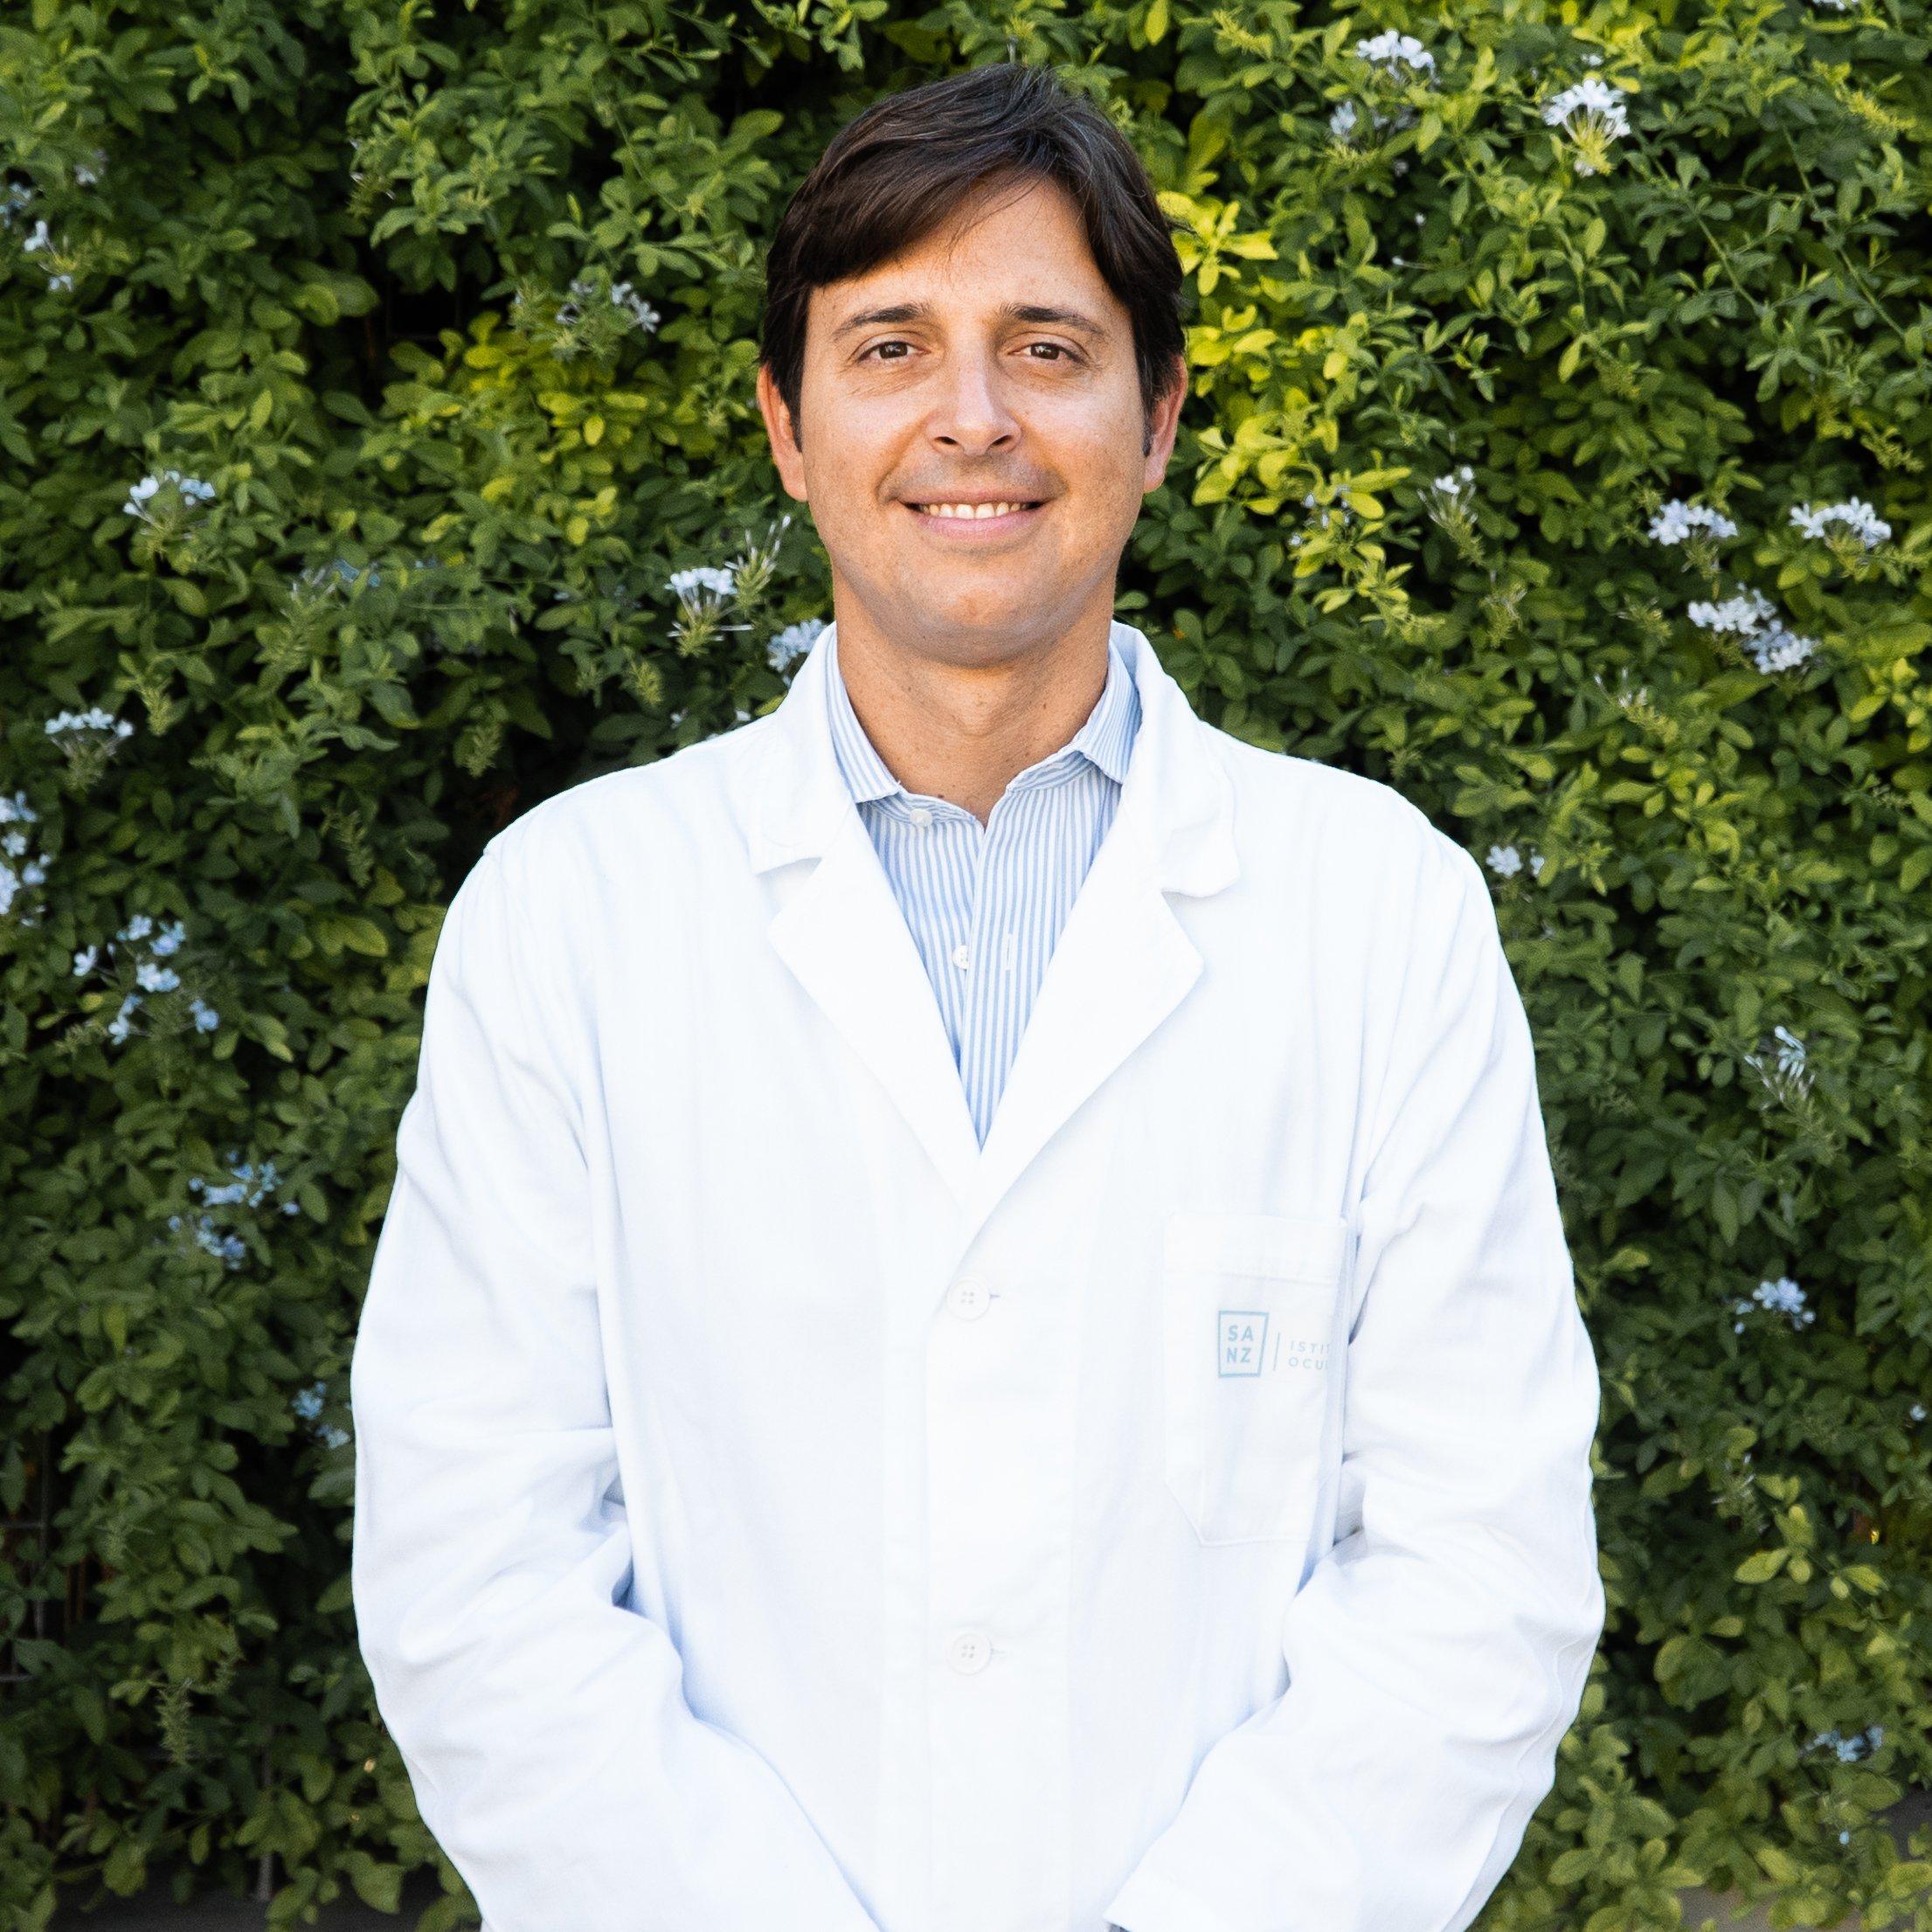 Dott. Felipe Sanz